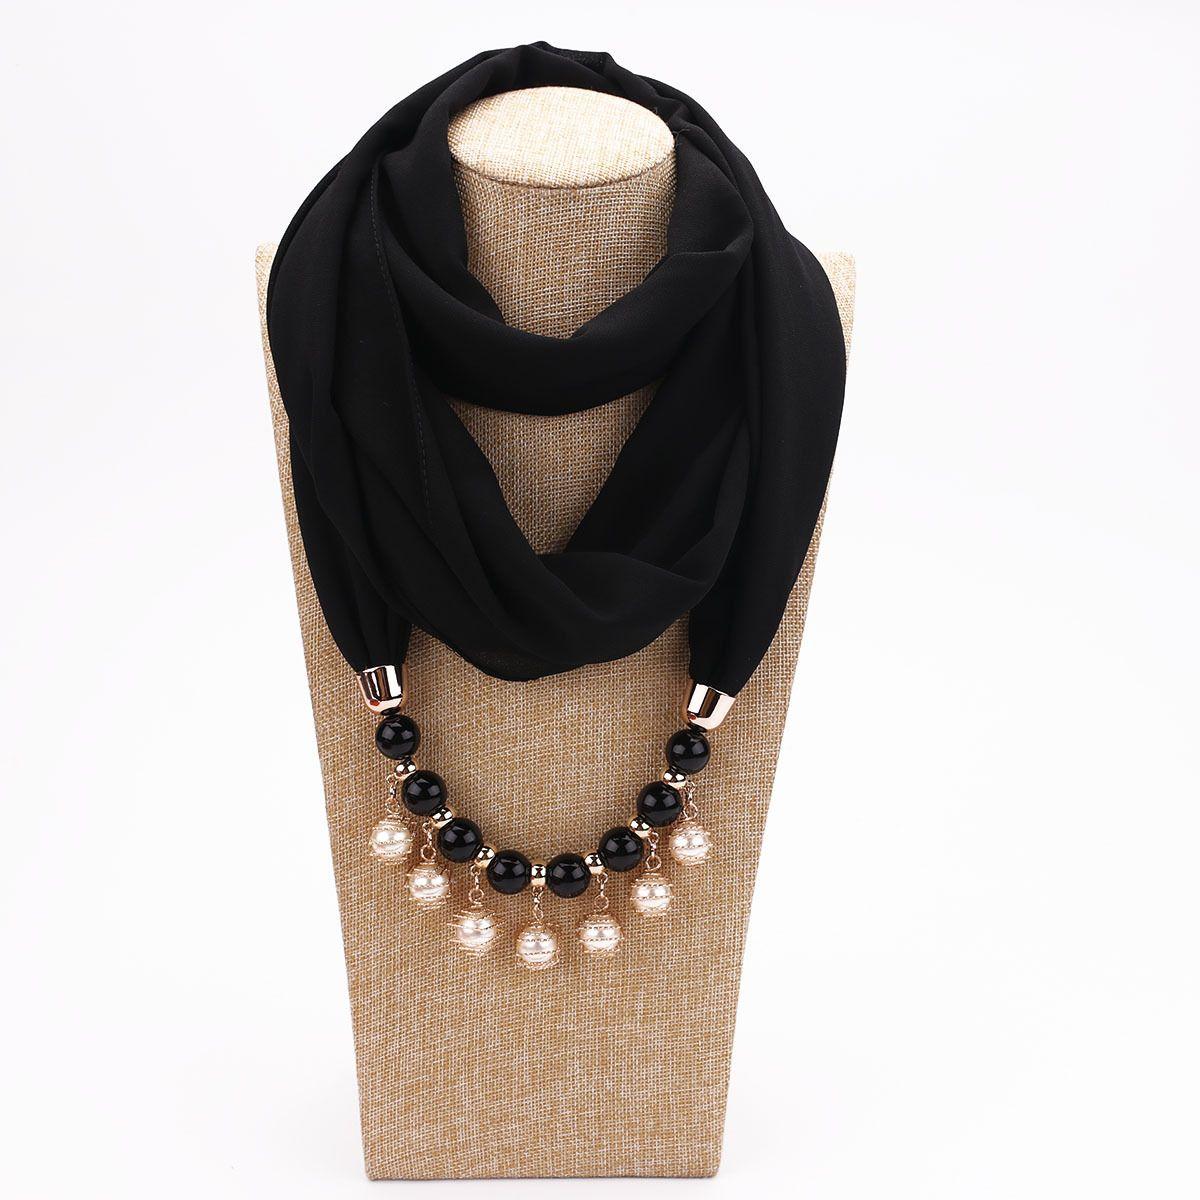 Мода жемчужина шифон ожерелье кулон кольцо шарф мульти-стиль мусульманские шарфы Hijab Hat Voile Lady Vointer Hijabs арабская голова шарф